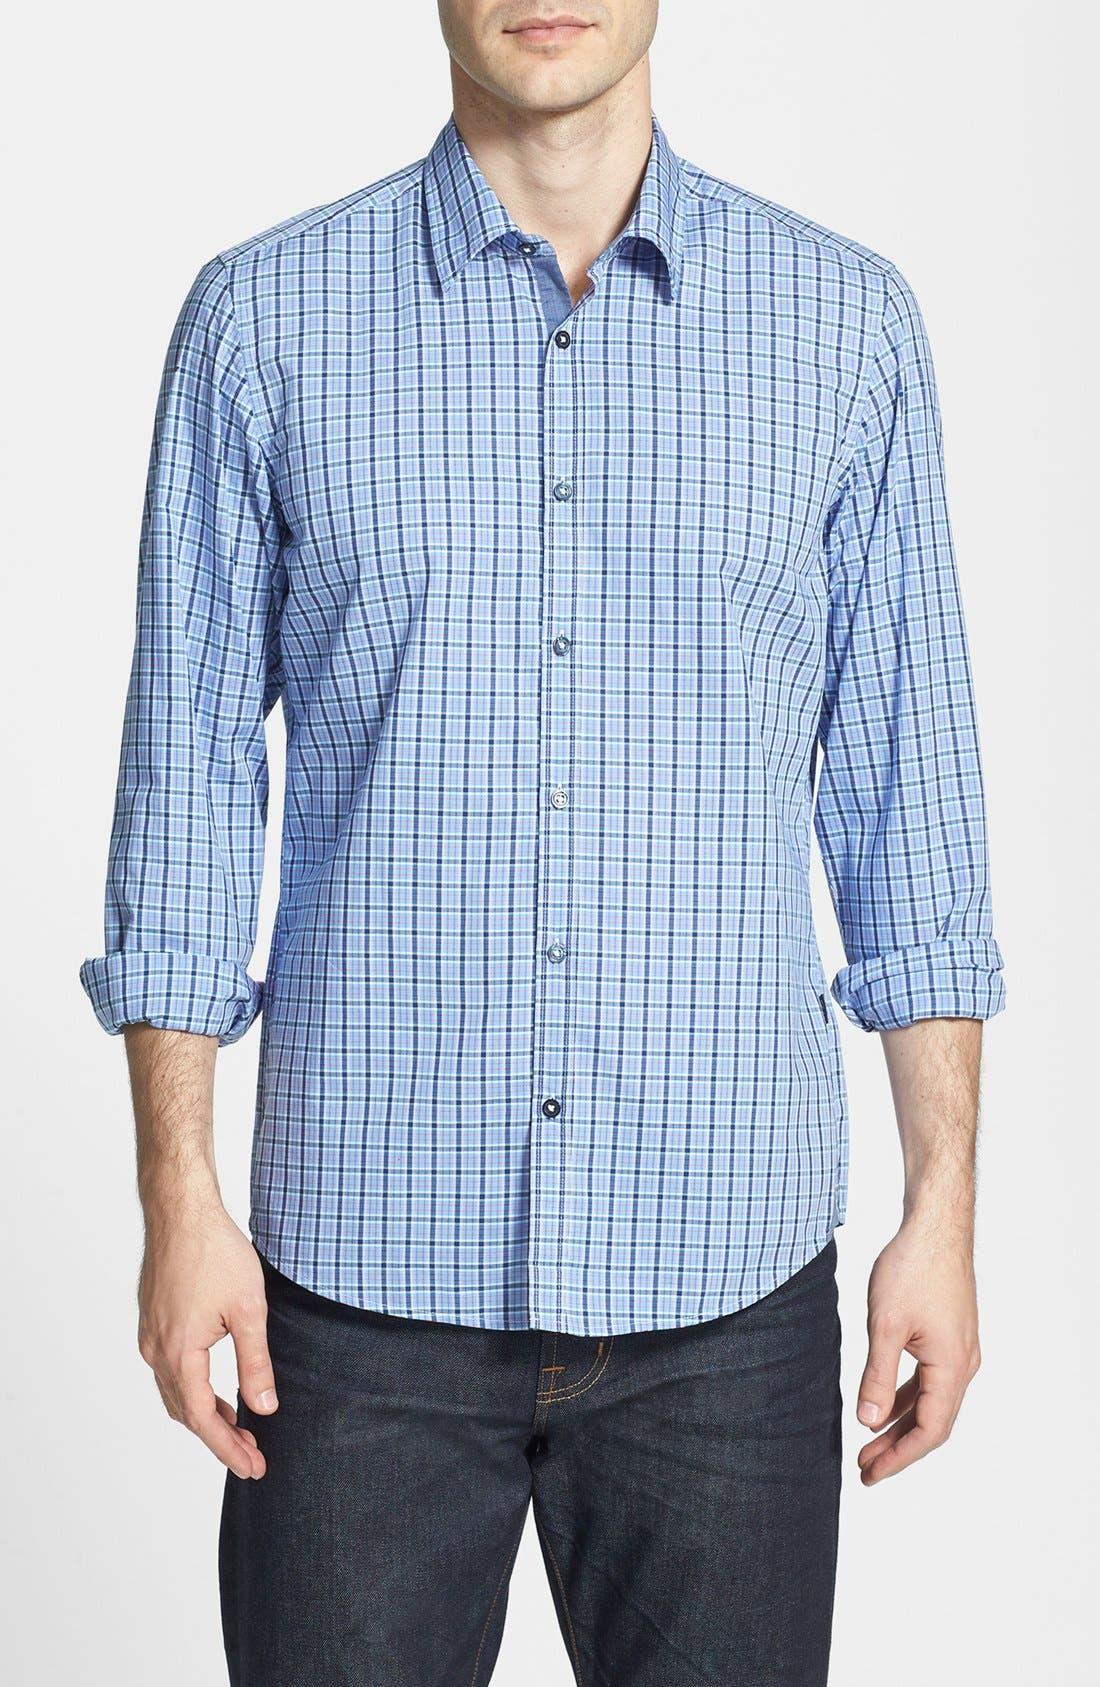 Main Image - BOSS HUGO BOSS 'Obert' Plaid Sport Shirt